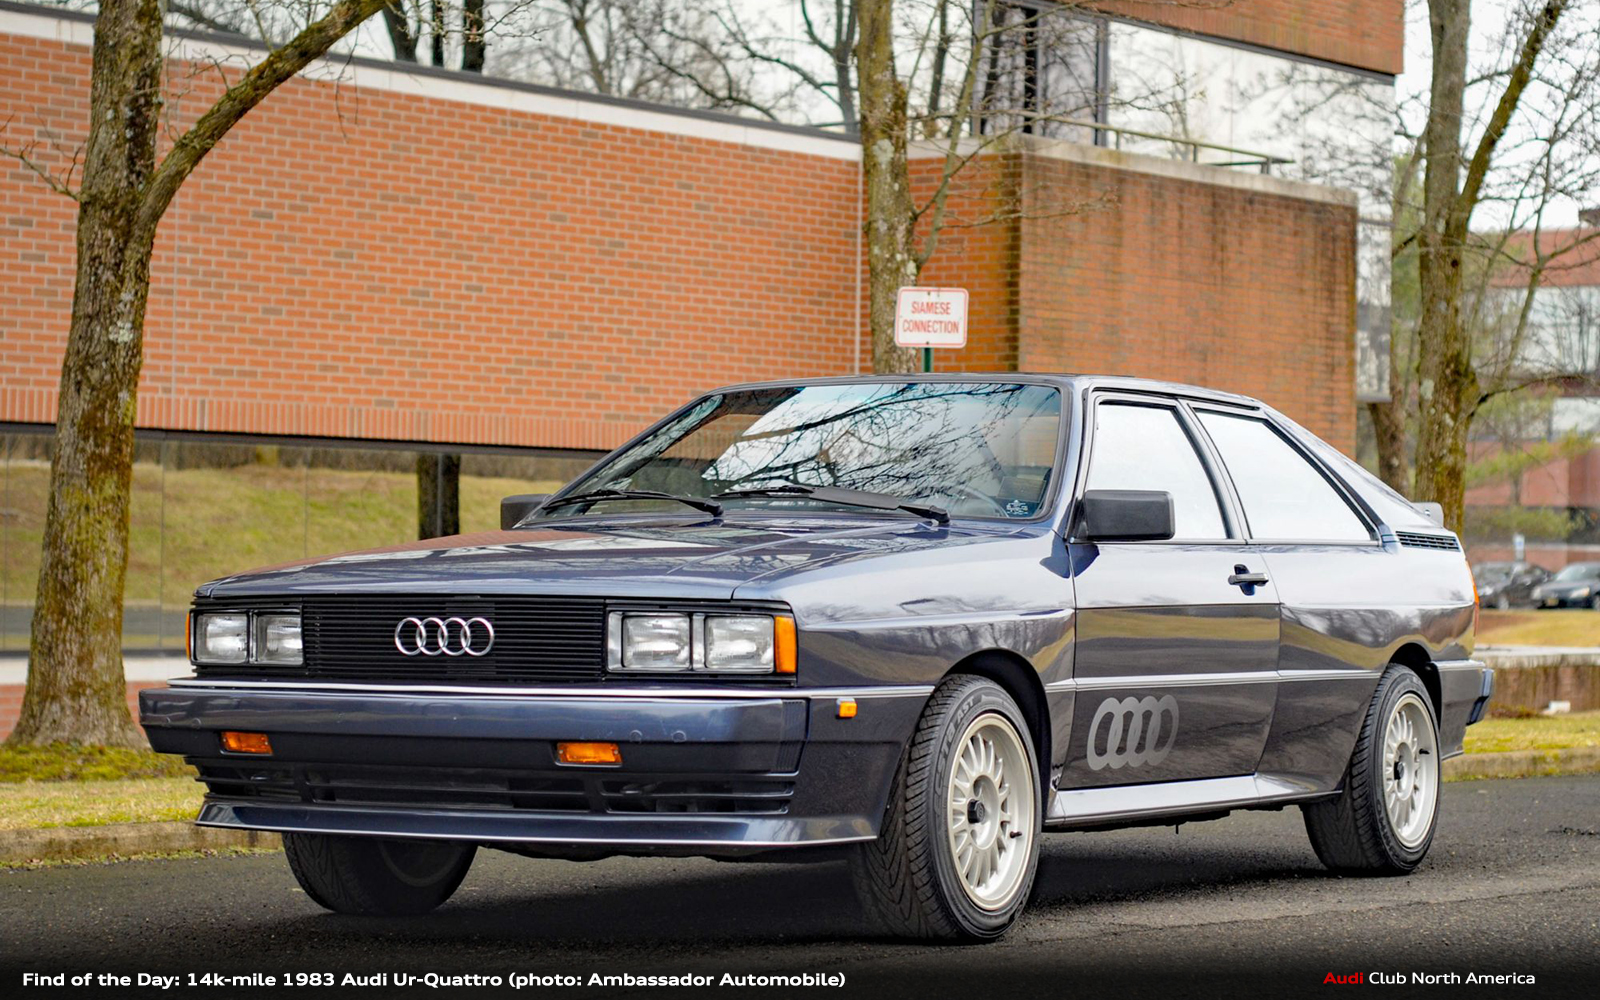 Find of the Day: 14k-mile 1983 Audi Ur-quattro